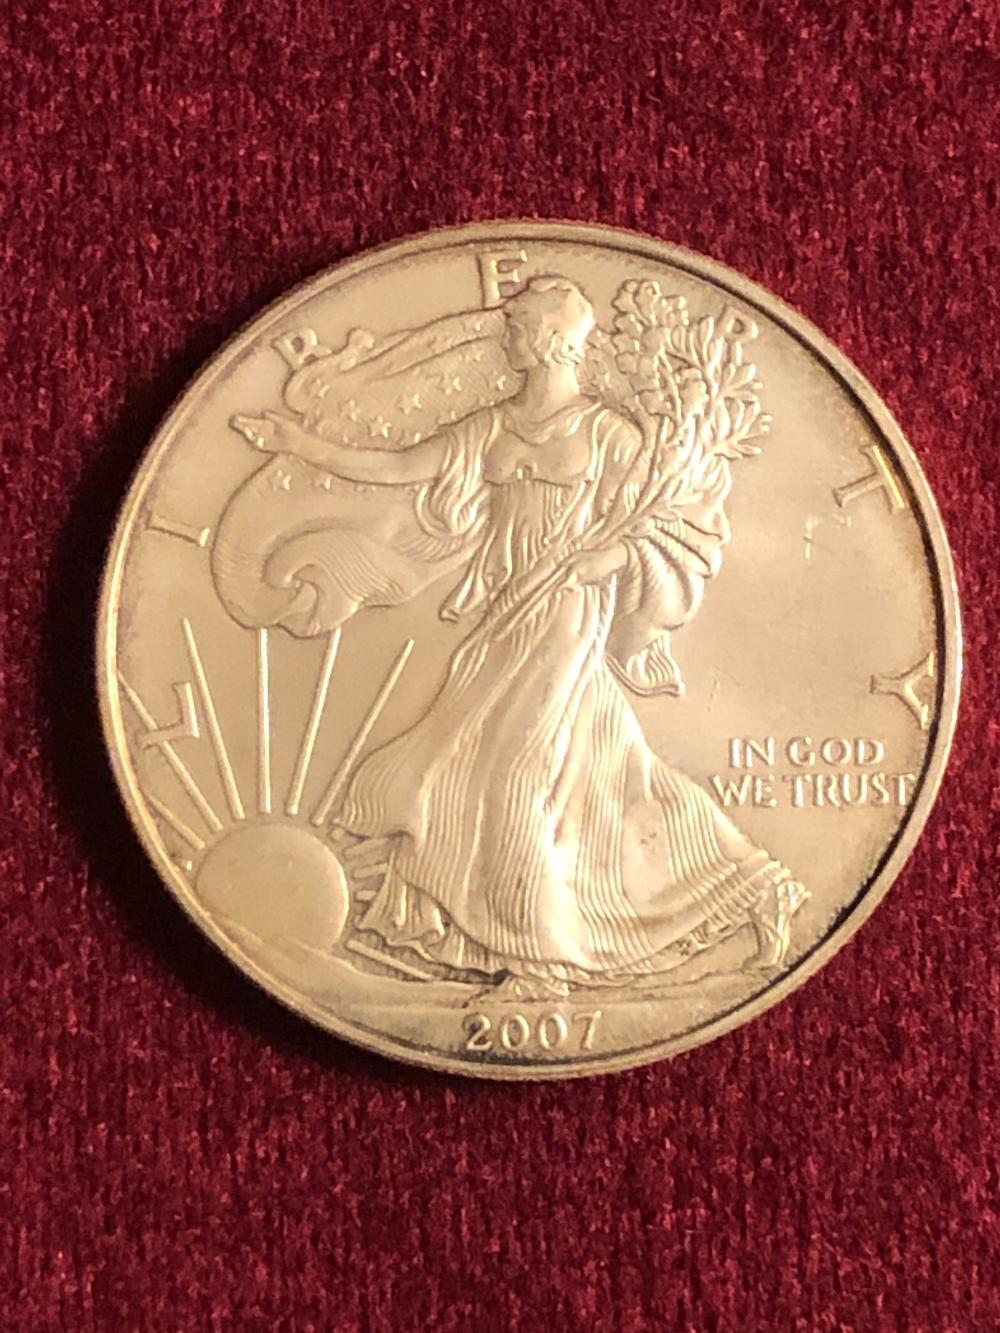 2007 1 oz fine silver walking liberty coin